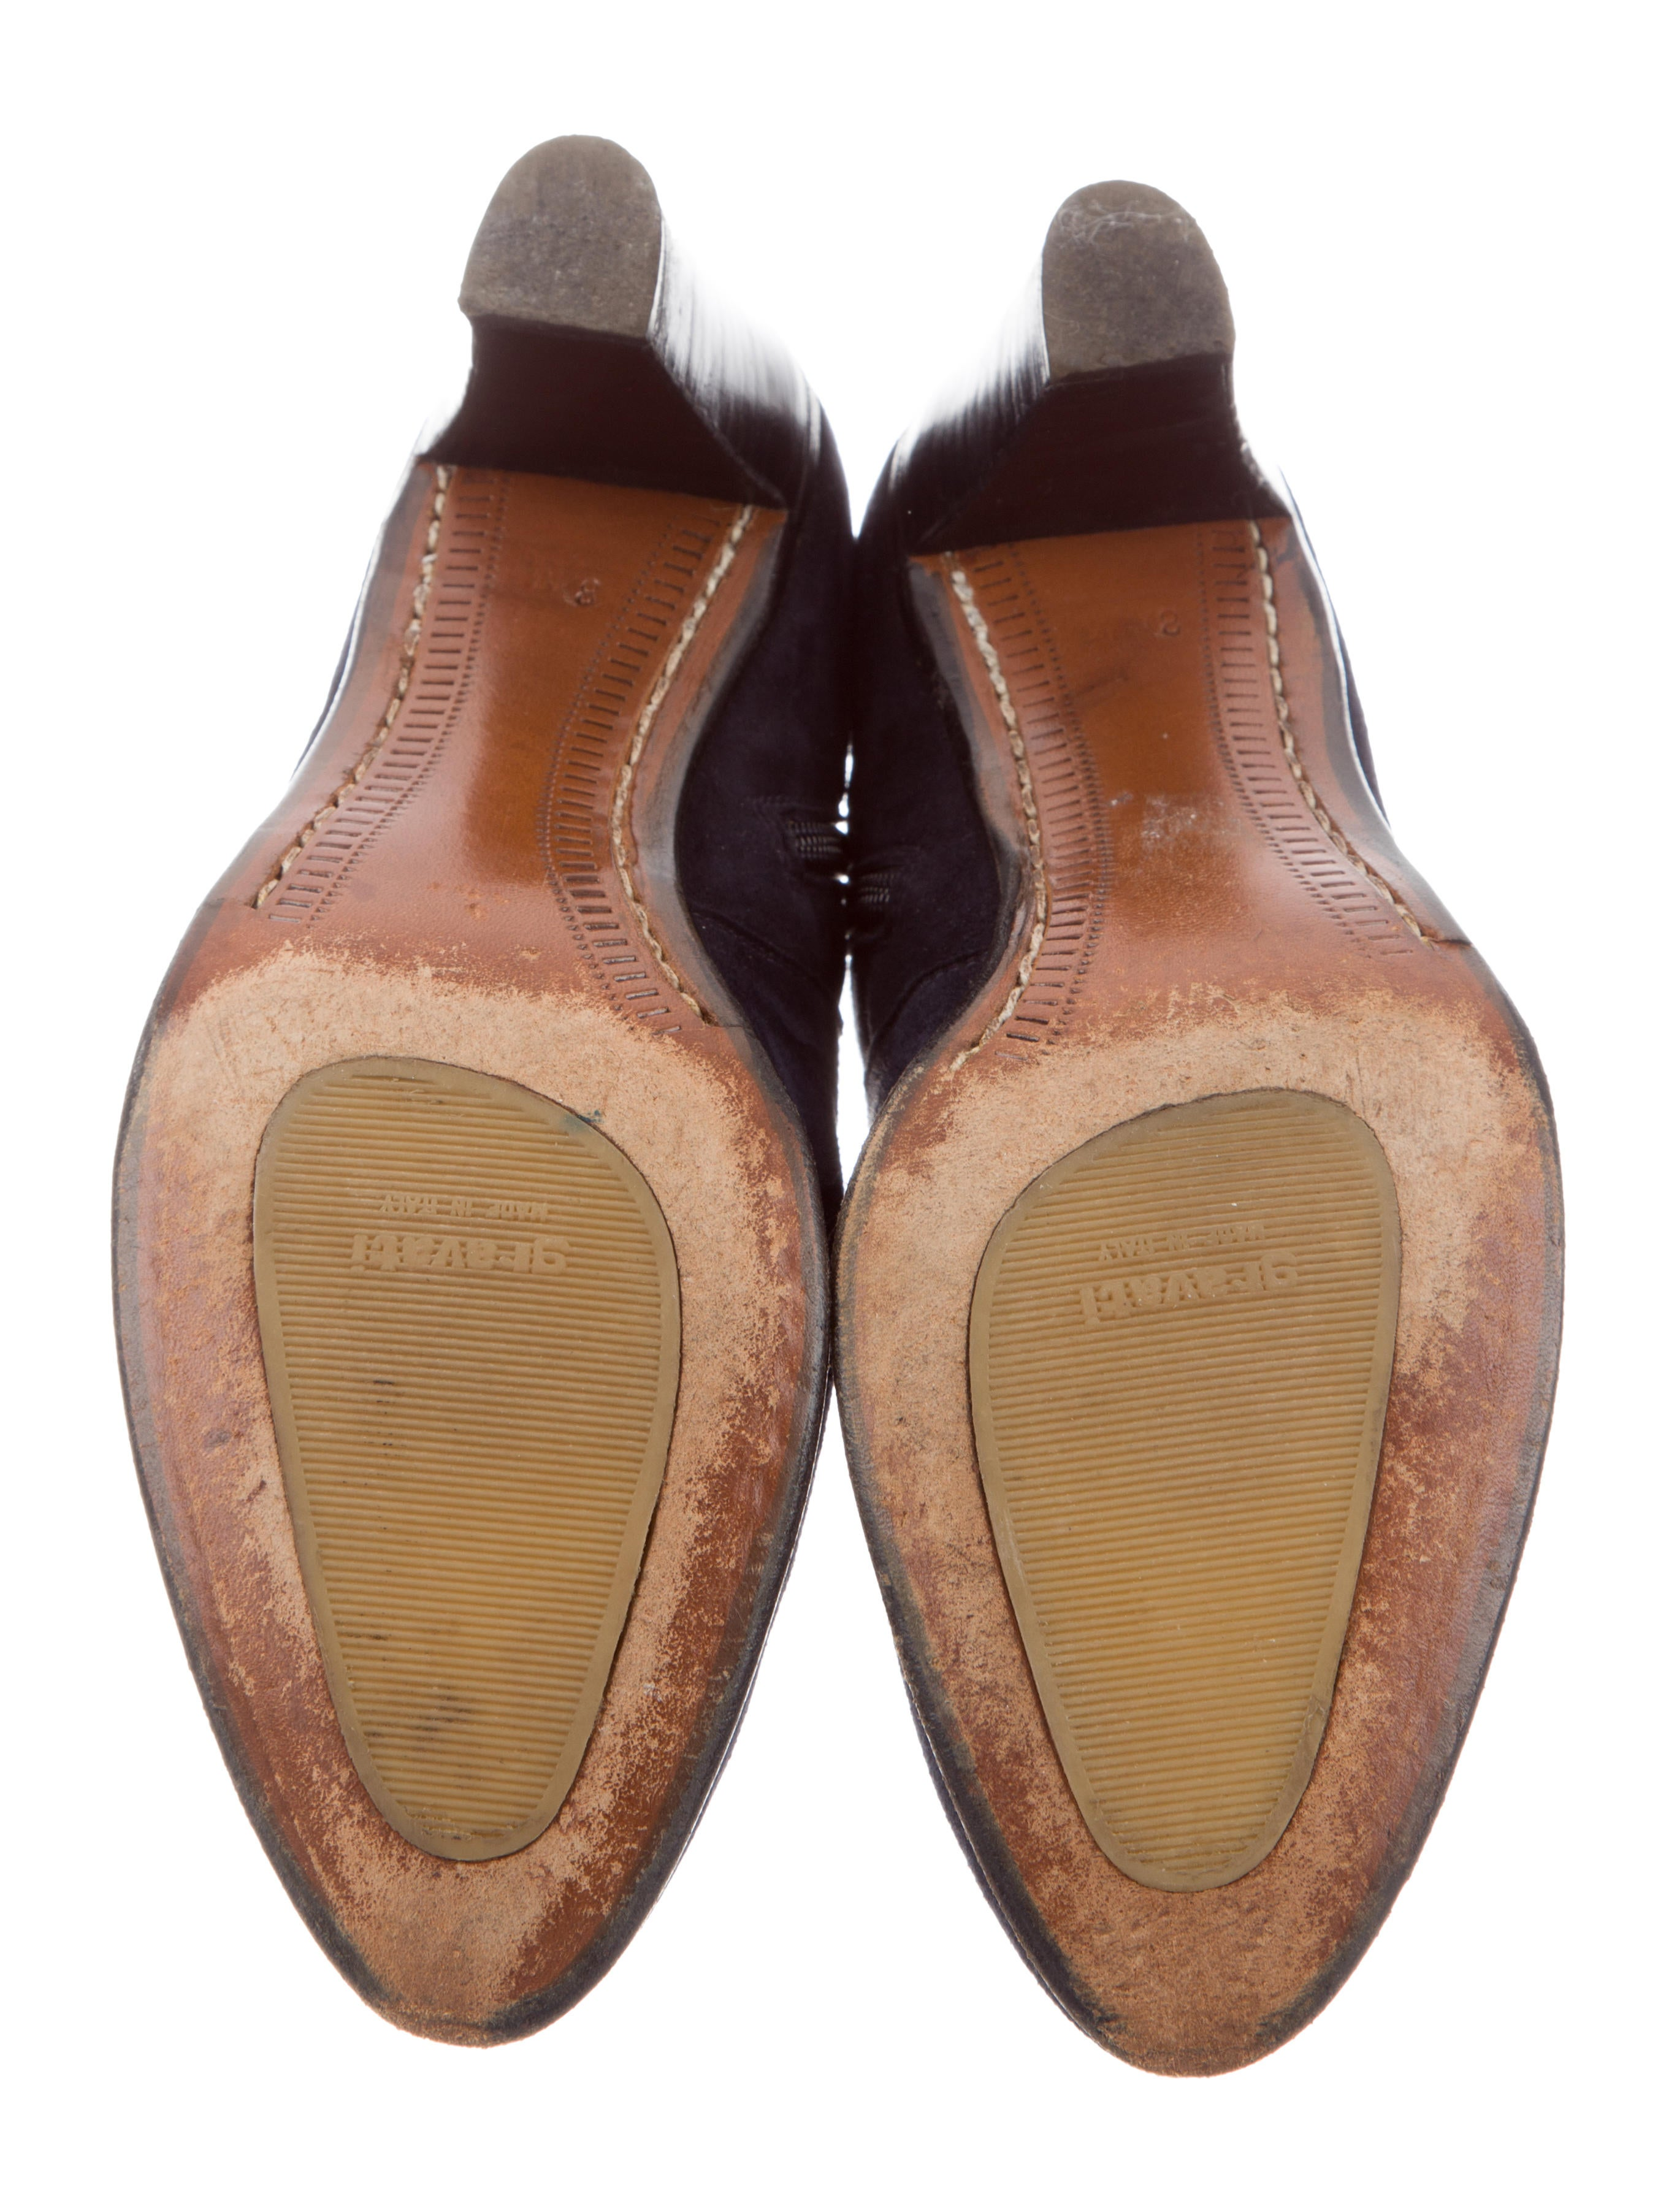 Gravati Gravati Shoes WGT20318 | The RealReal